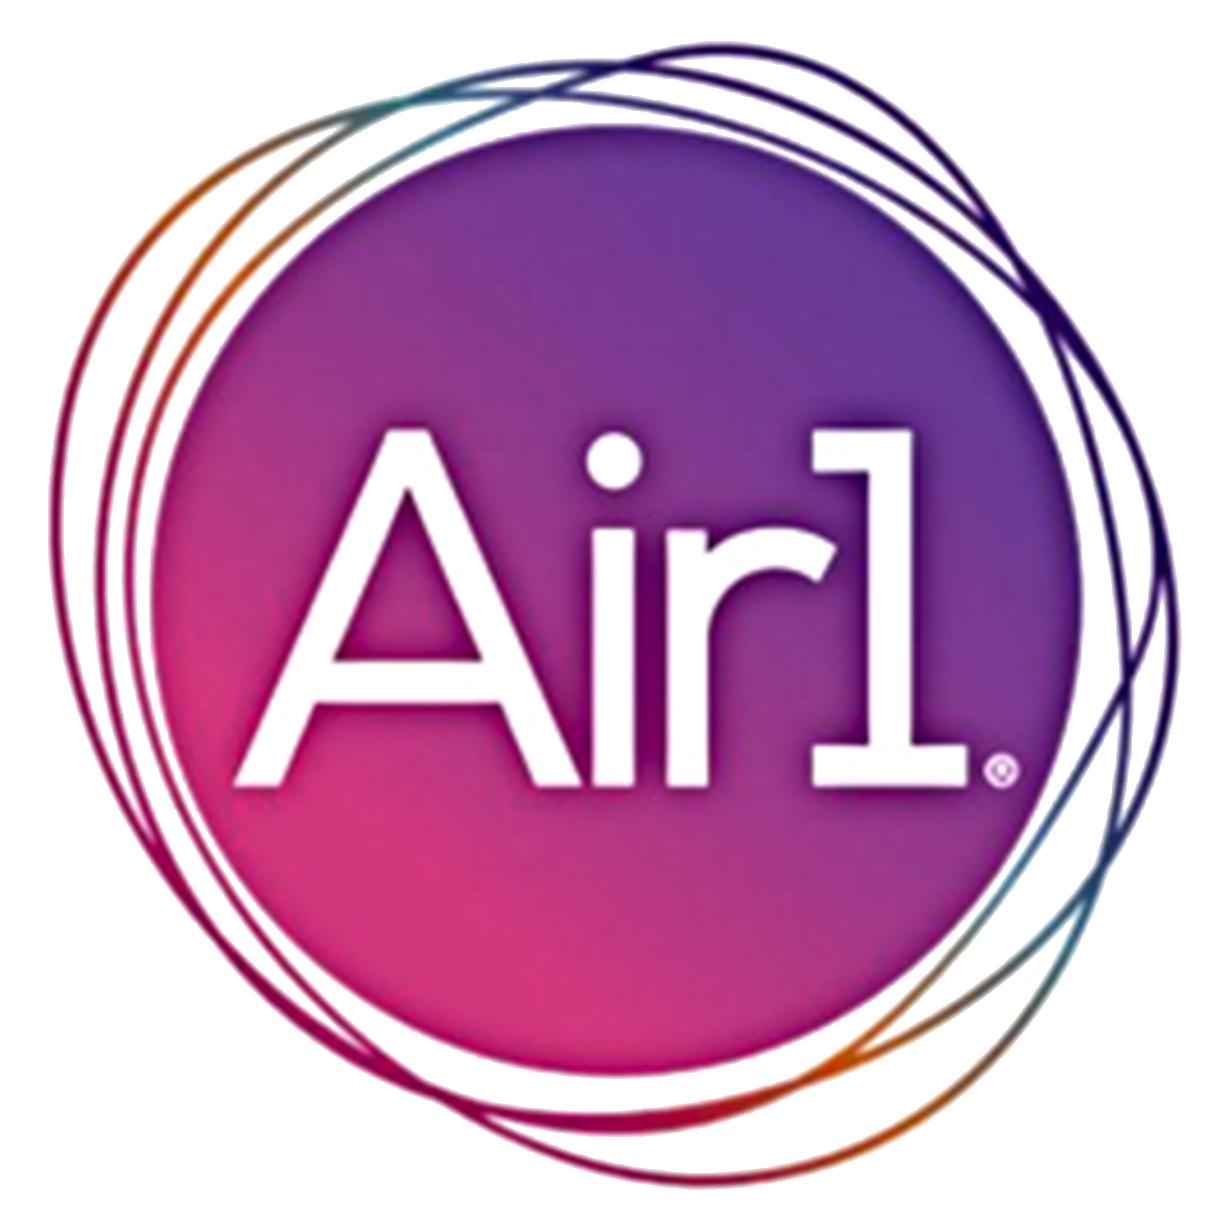 air1logo.png